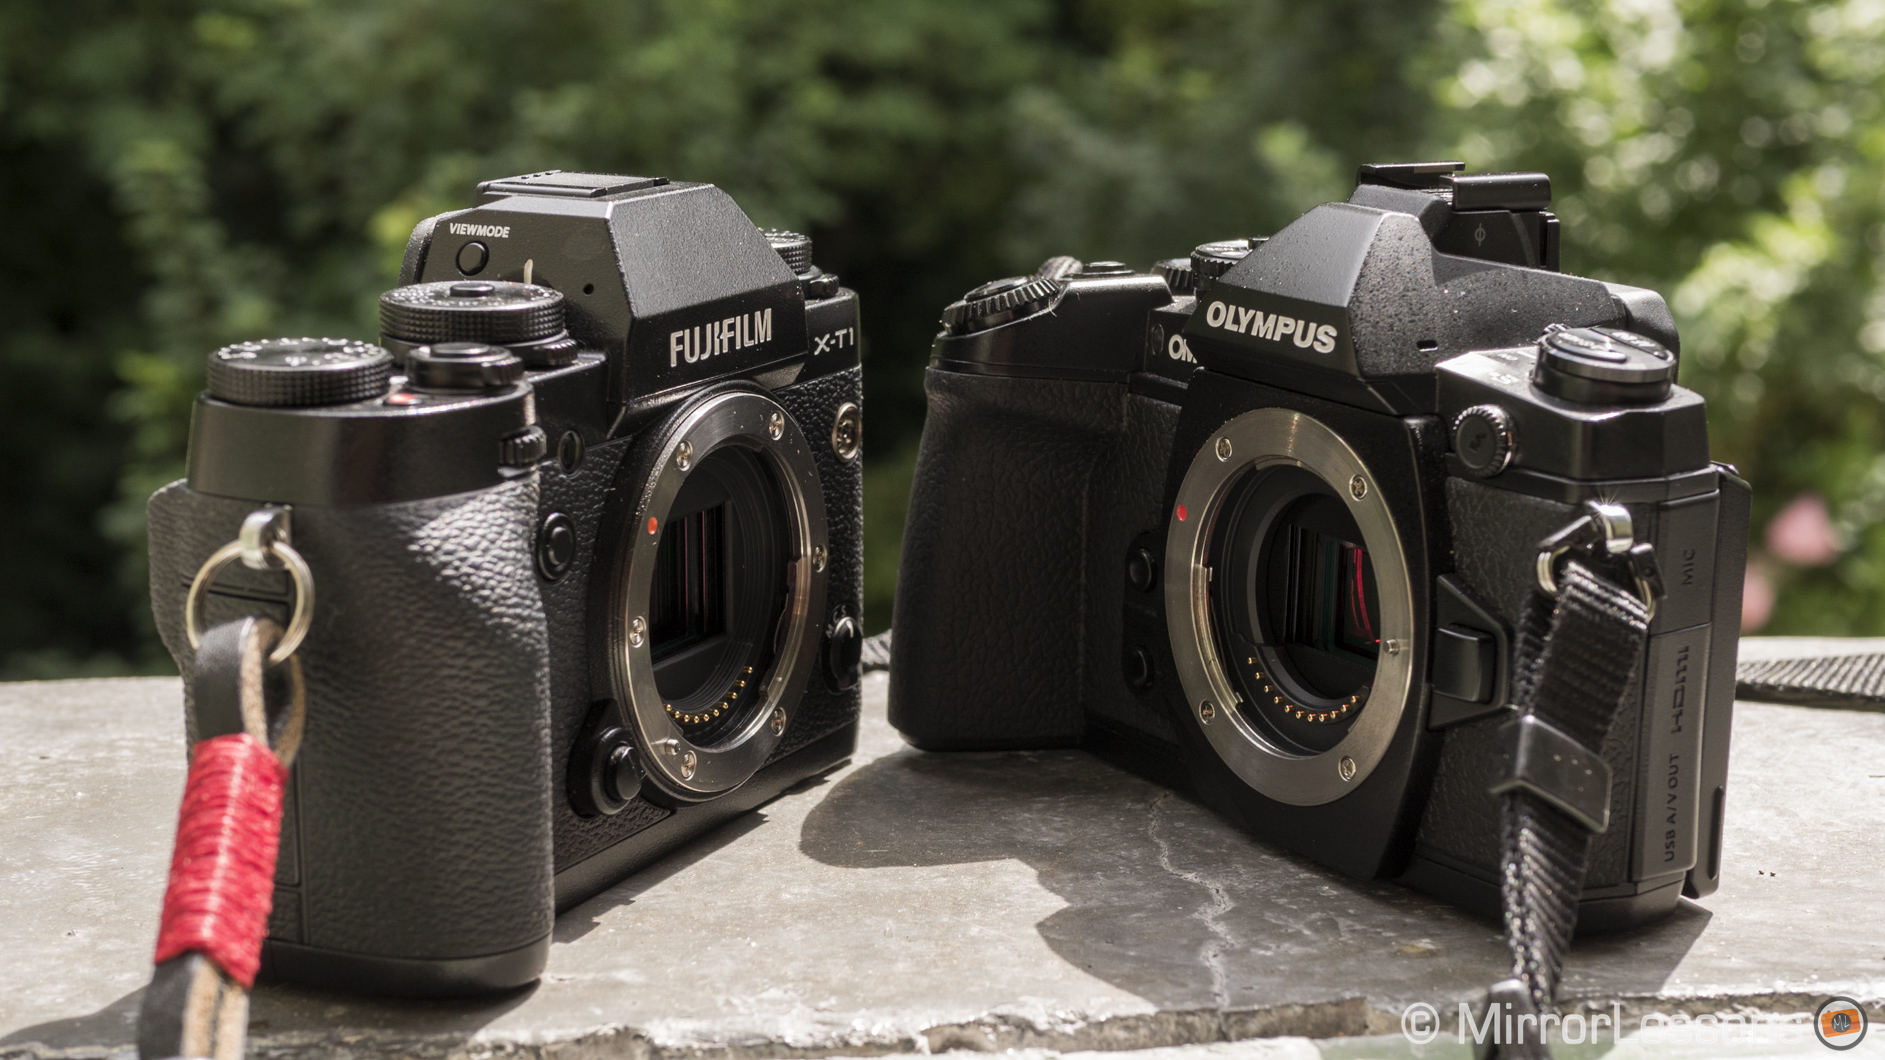 Olympus OM-D E-M1 vs. Fujifilm X-T1